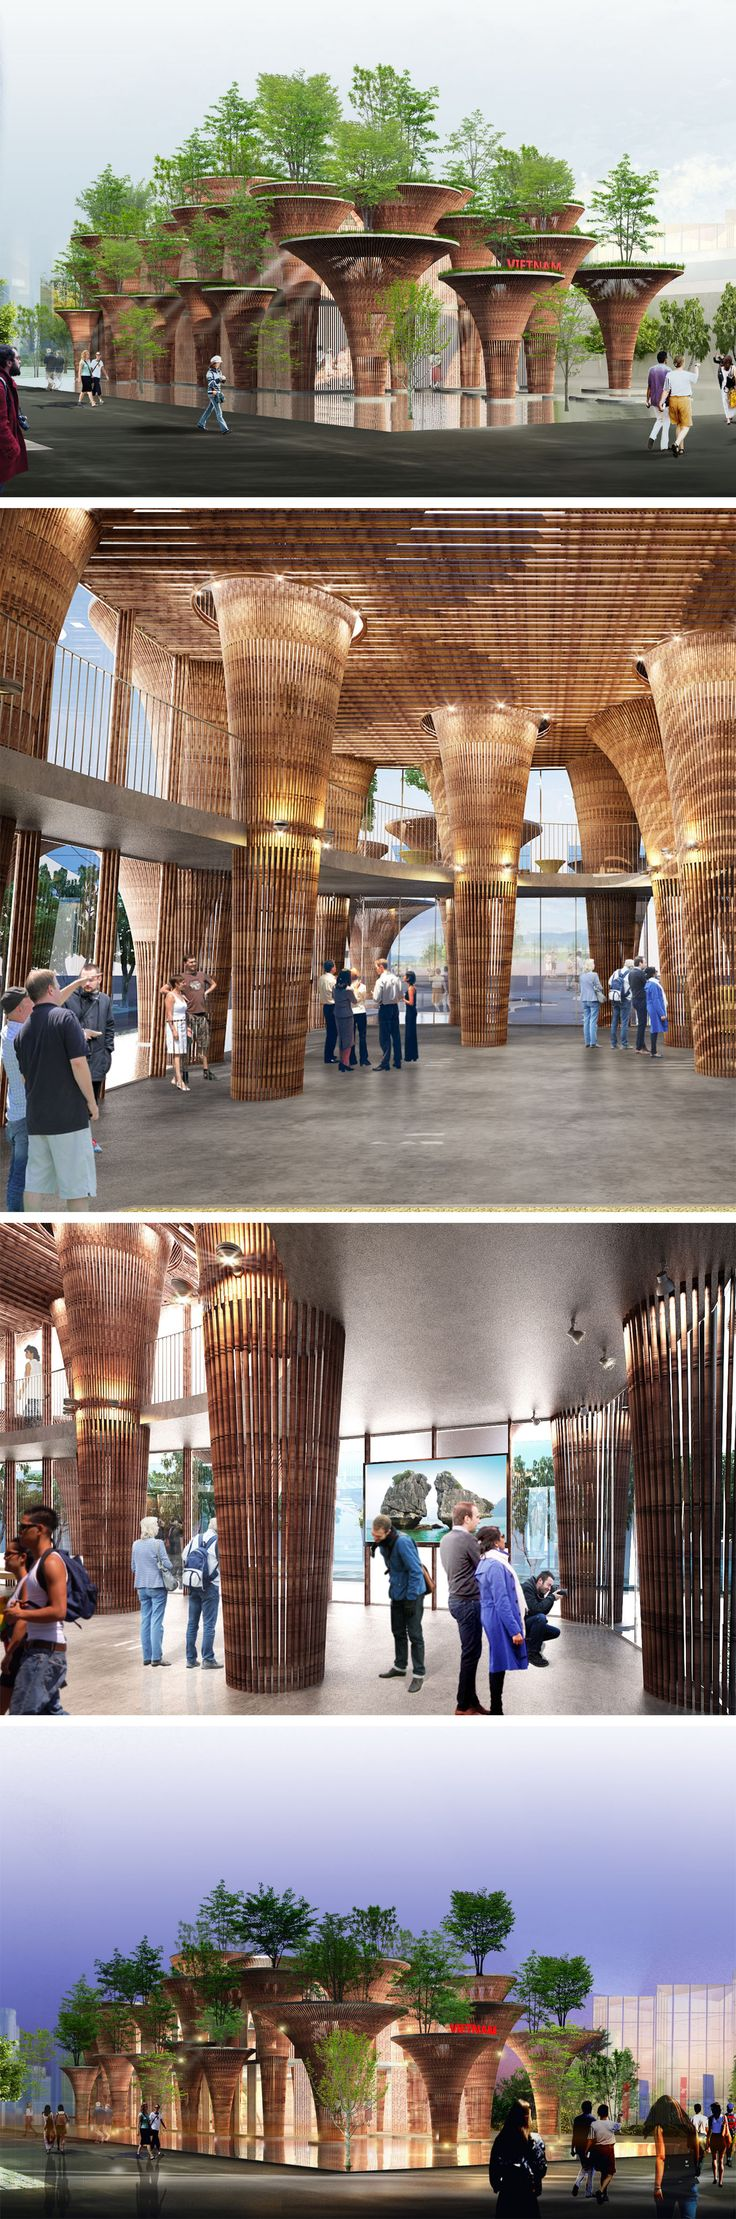 Meu mais novo ídolo| Vietnam Pavilion at Expo 2015 Milano, designed by Vo Trong Nghia architects